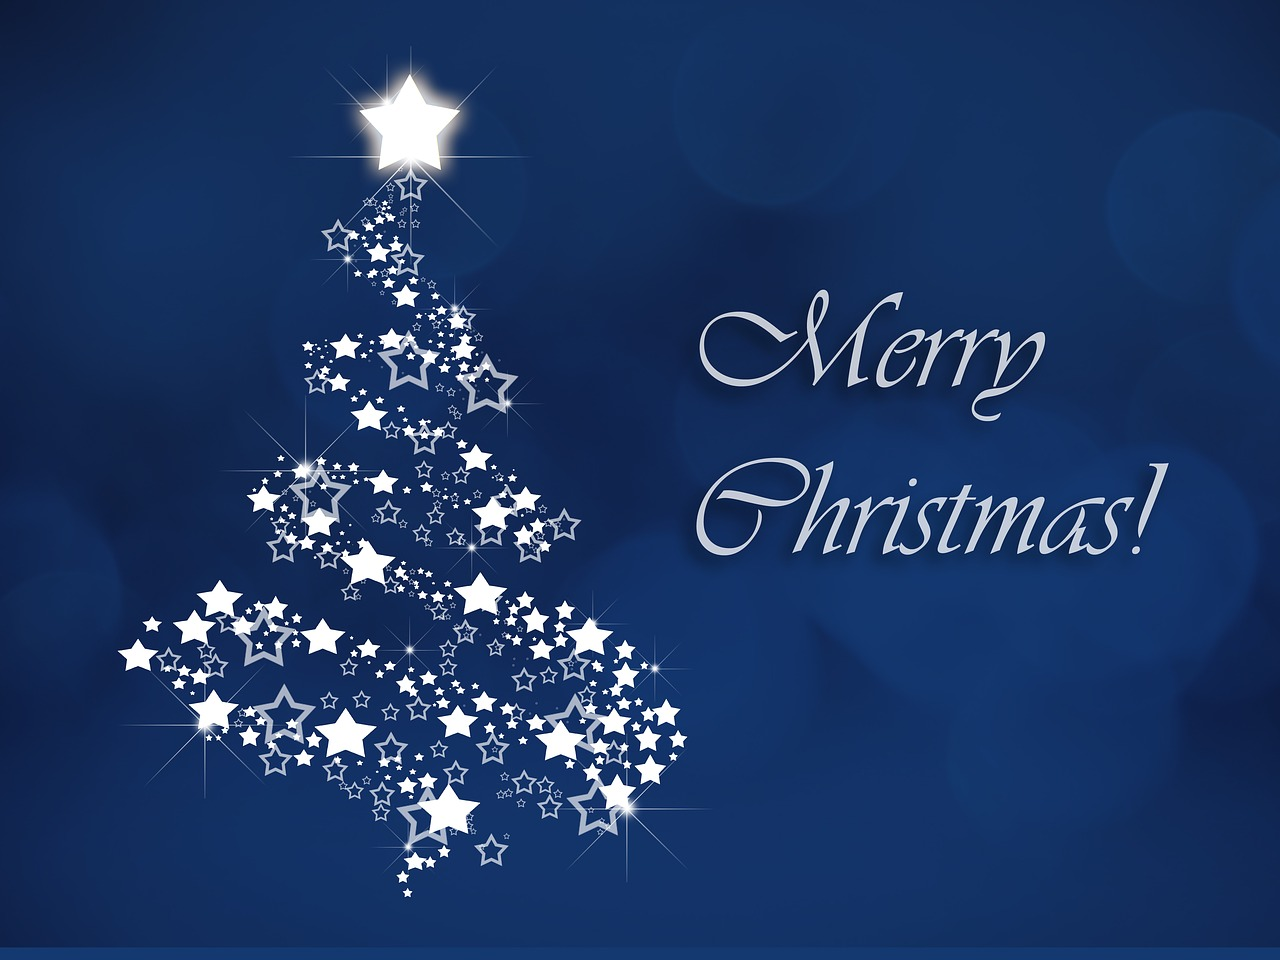 Christmas Card Merry - Free image on Pixabay